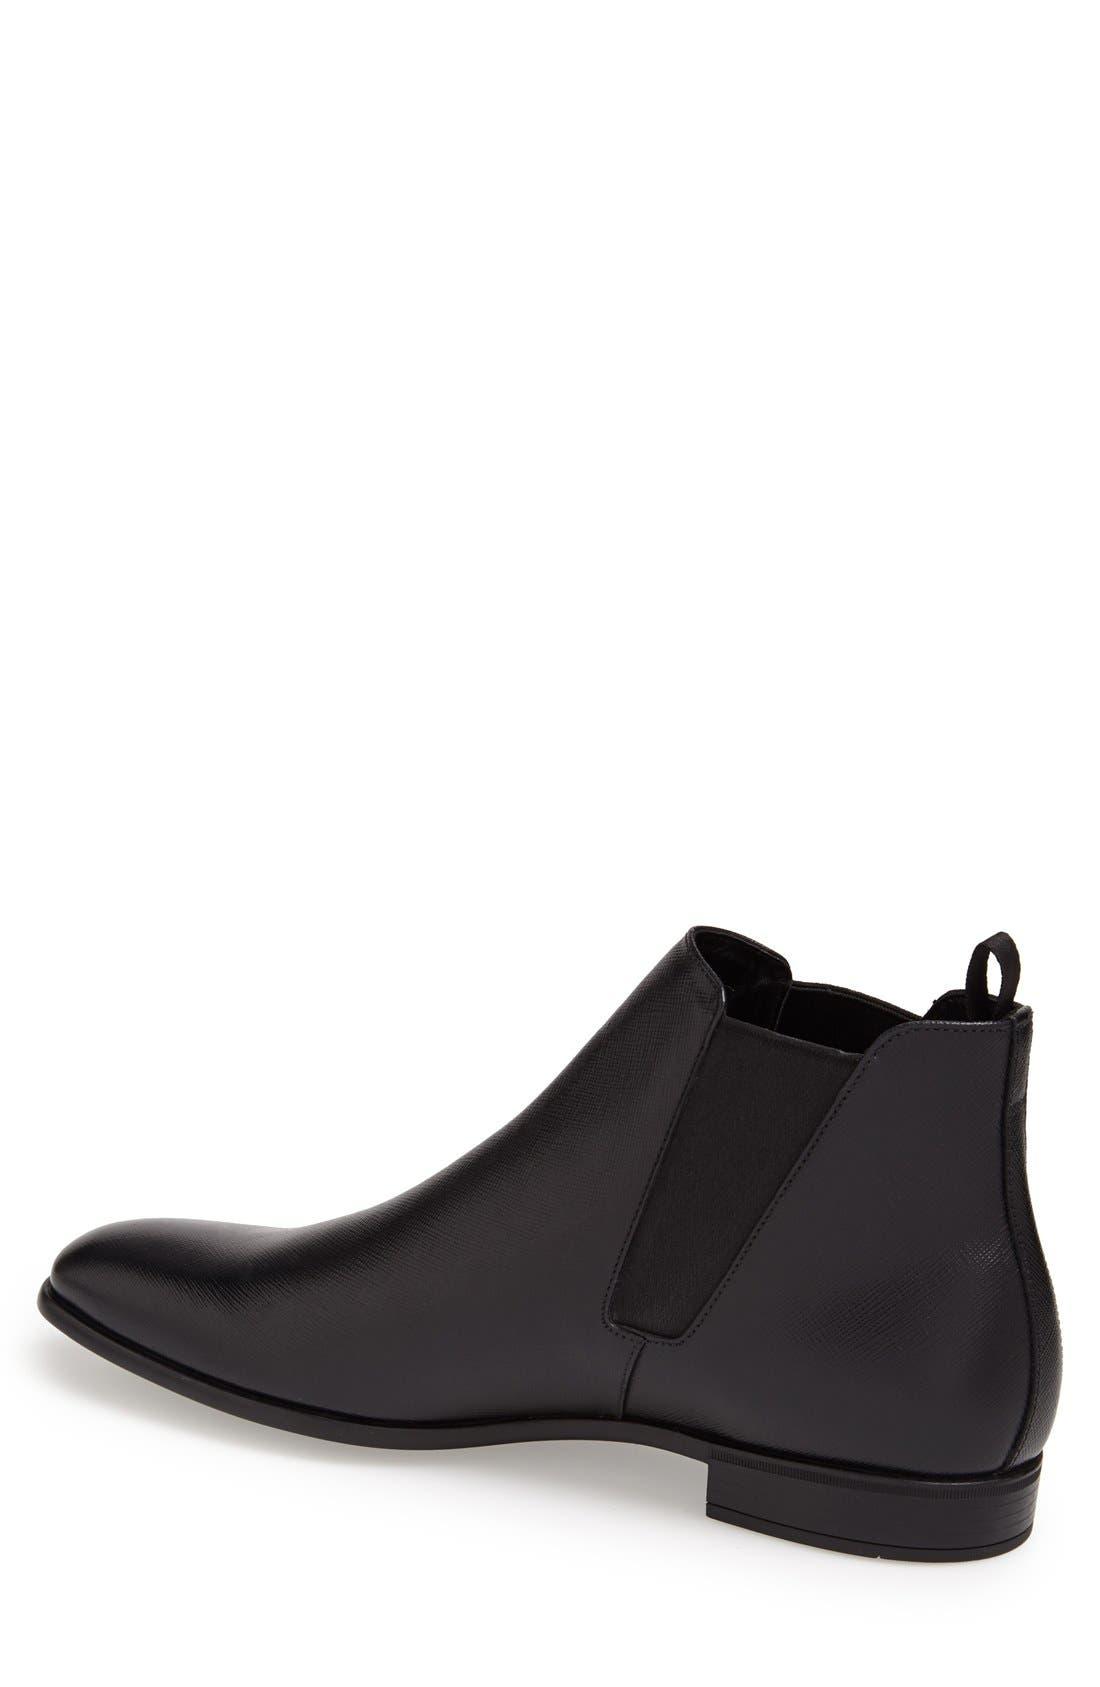 PRADA, Saffiano Leather Chelsea Boot, Alternate thumbnail 2, color, BLACK